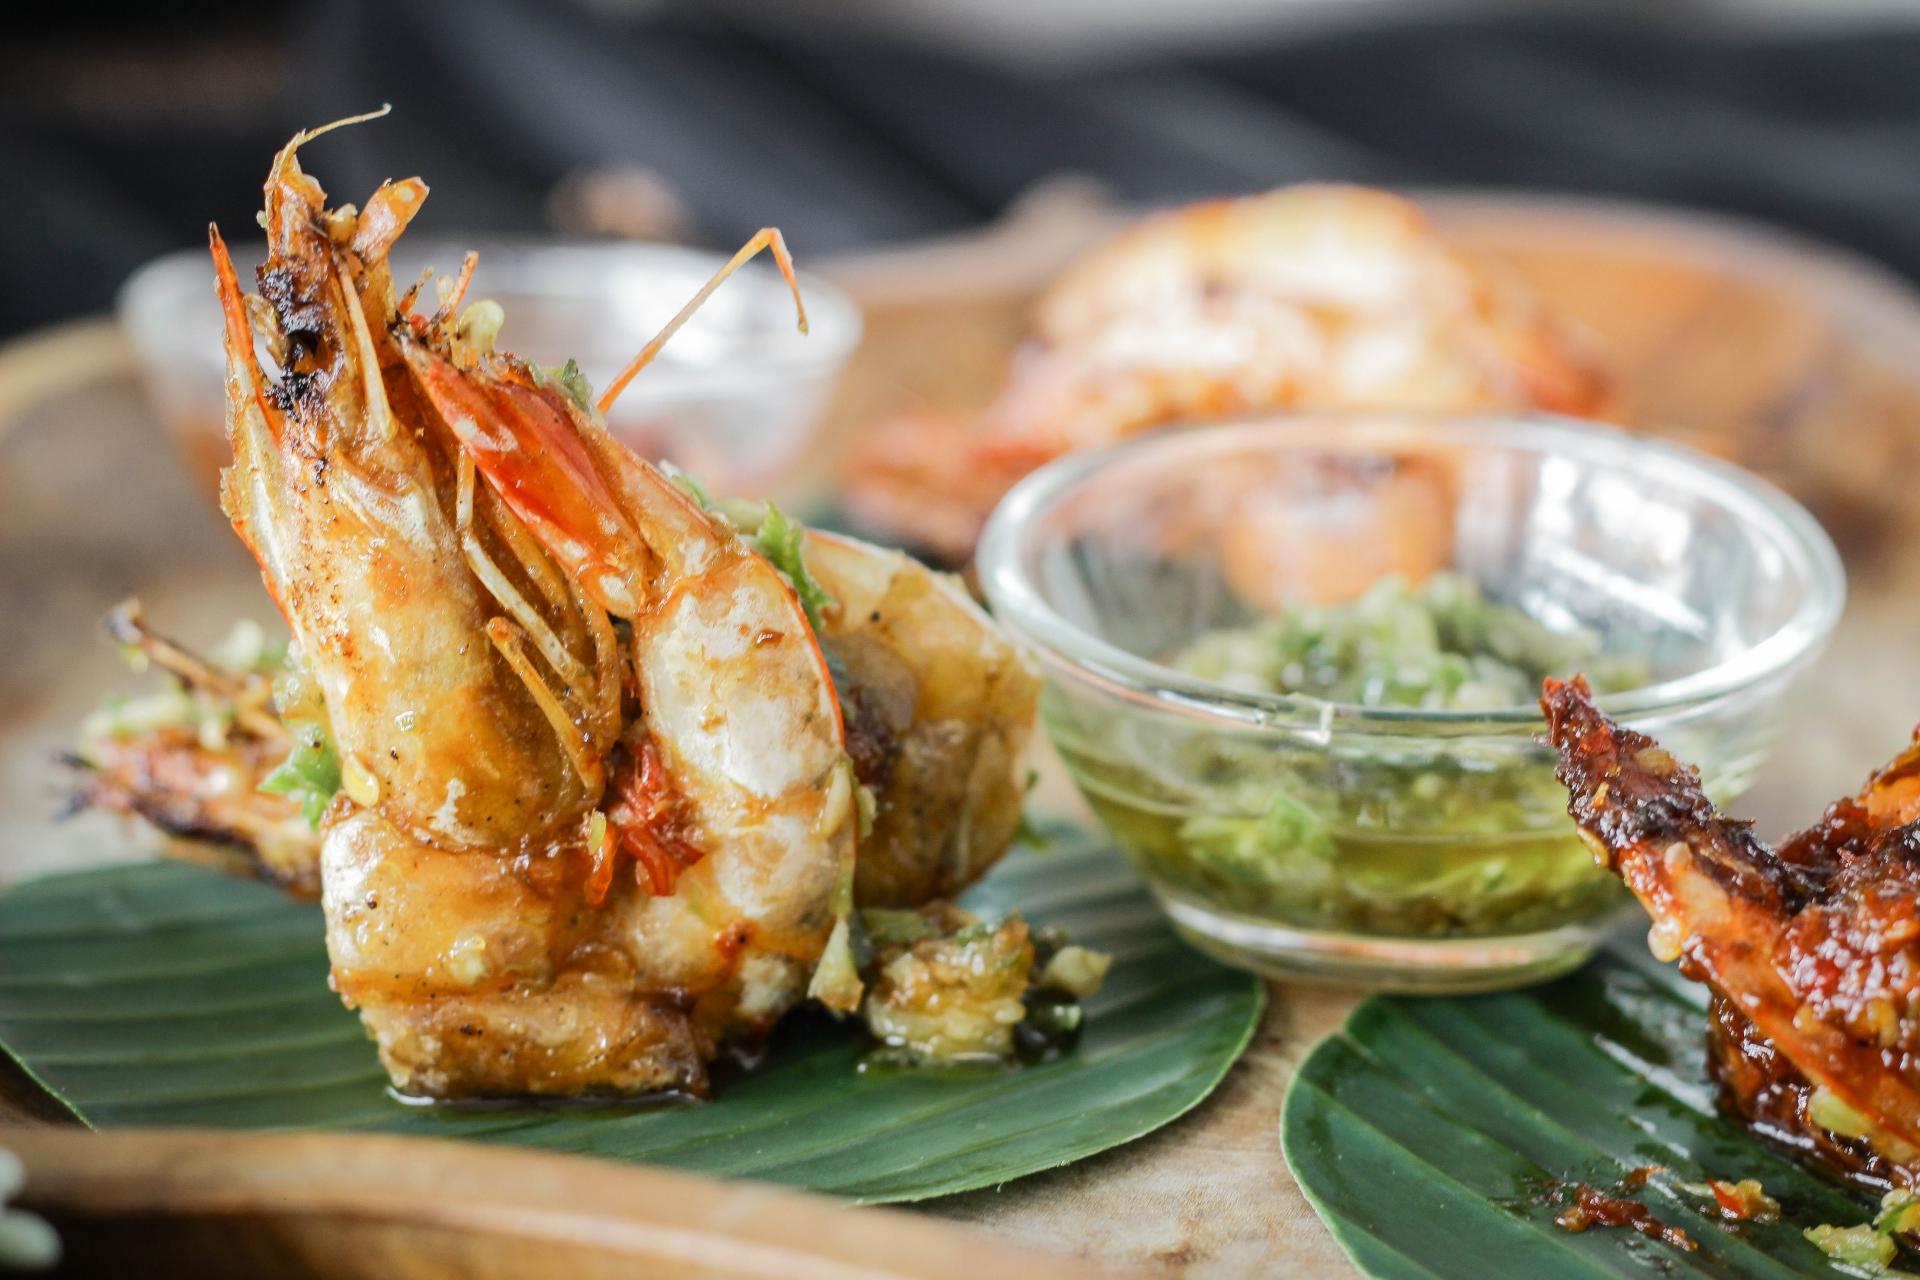 Denmark's Biomart acquires Viet-Uc's shrimp-feed business